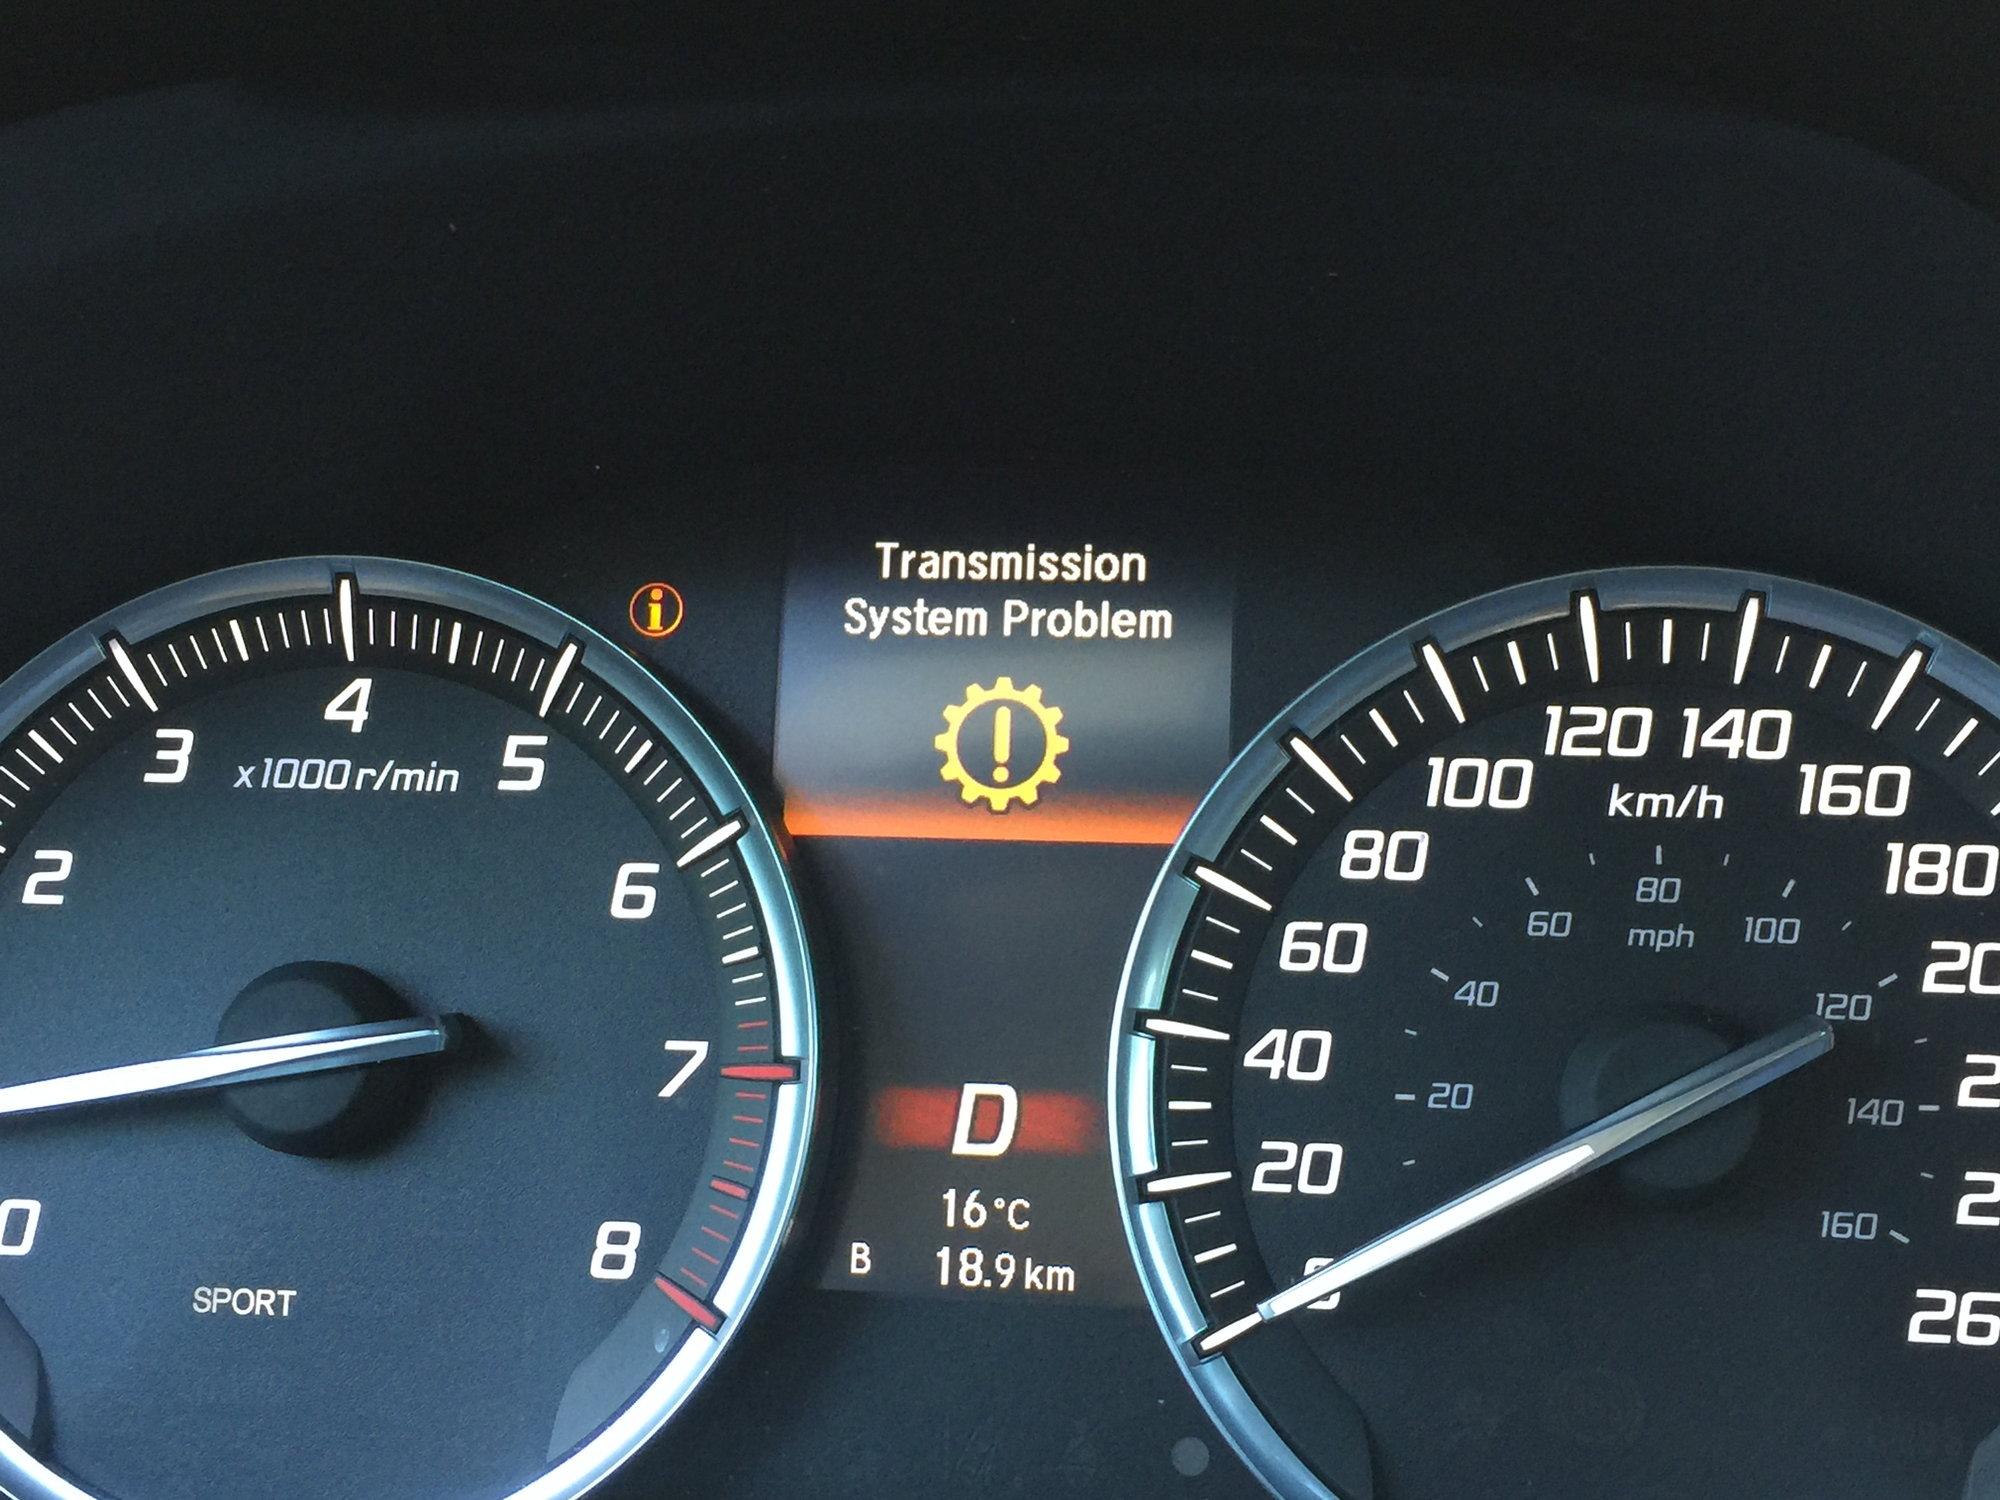 Transmission problem gear indicator flasing - AcuraZine